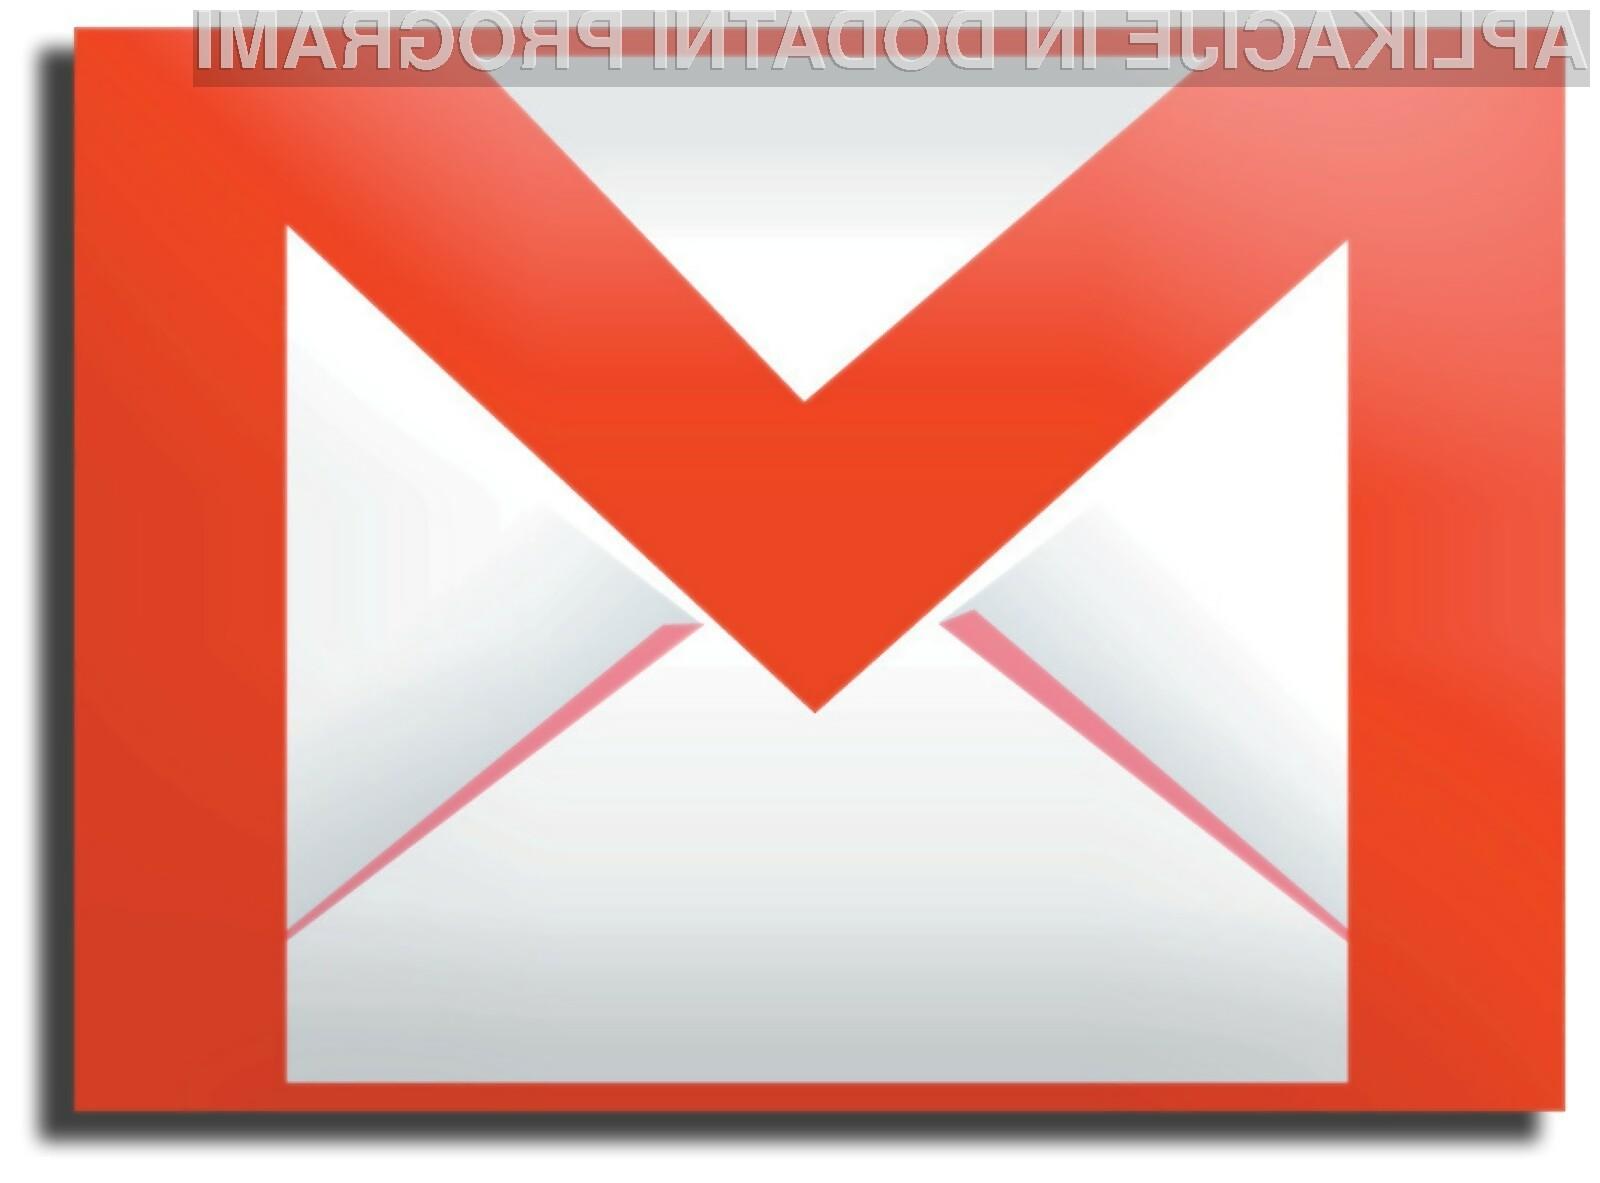 Gmail se je končno povzpel na vrh, a glavna konkurenta mu močno dihata za ovratnik.